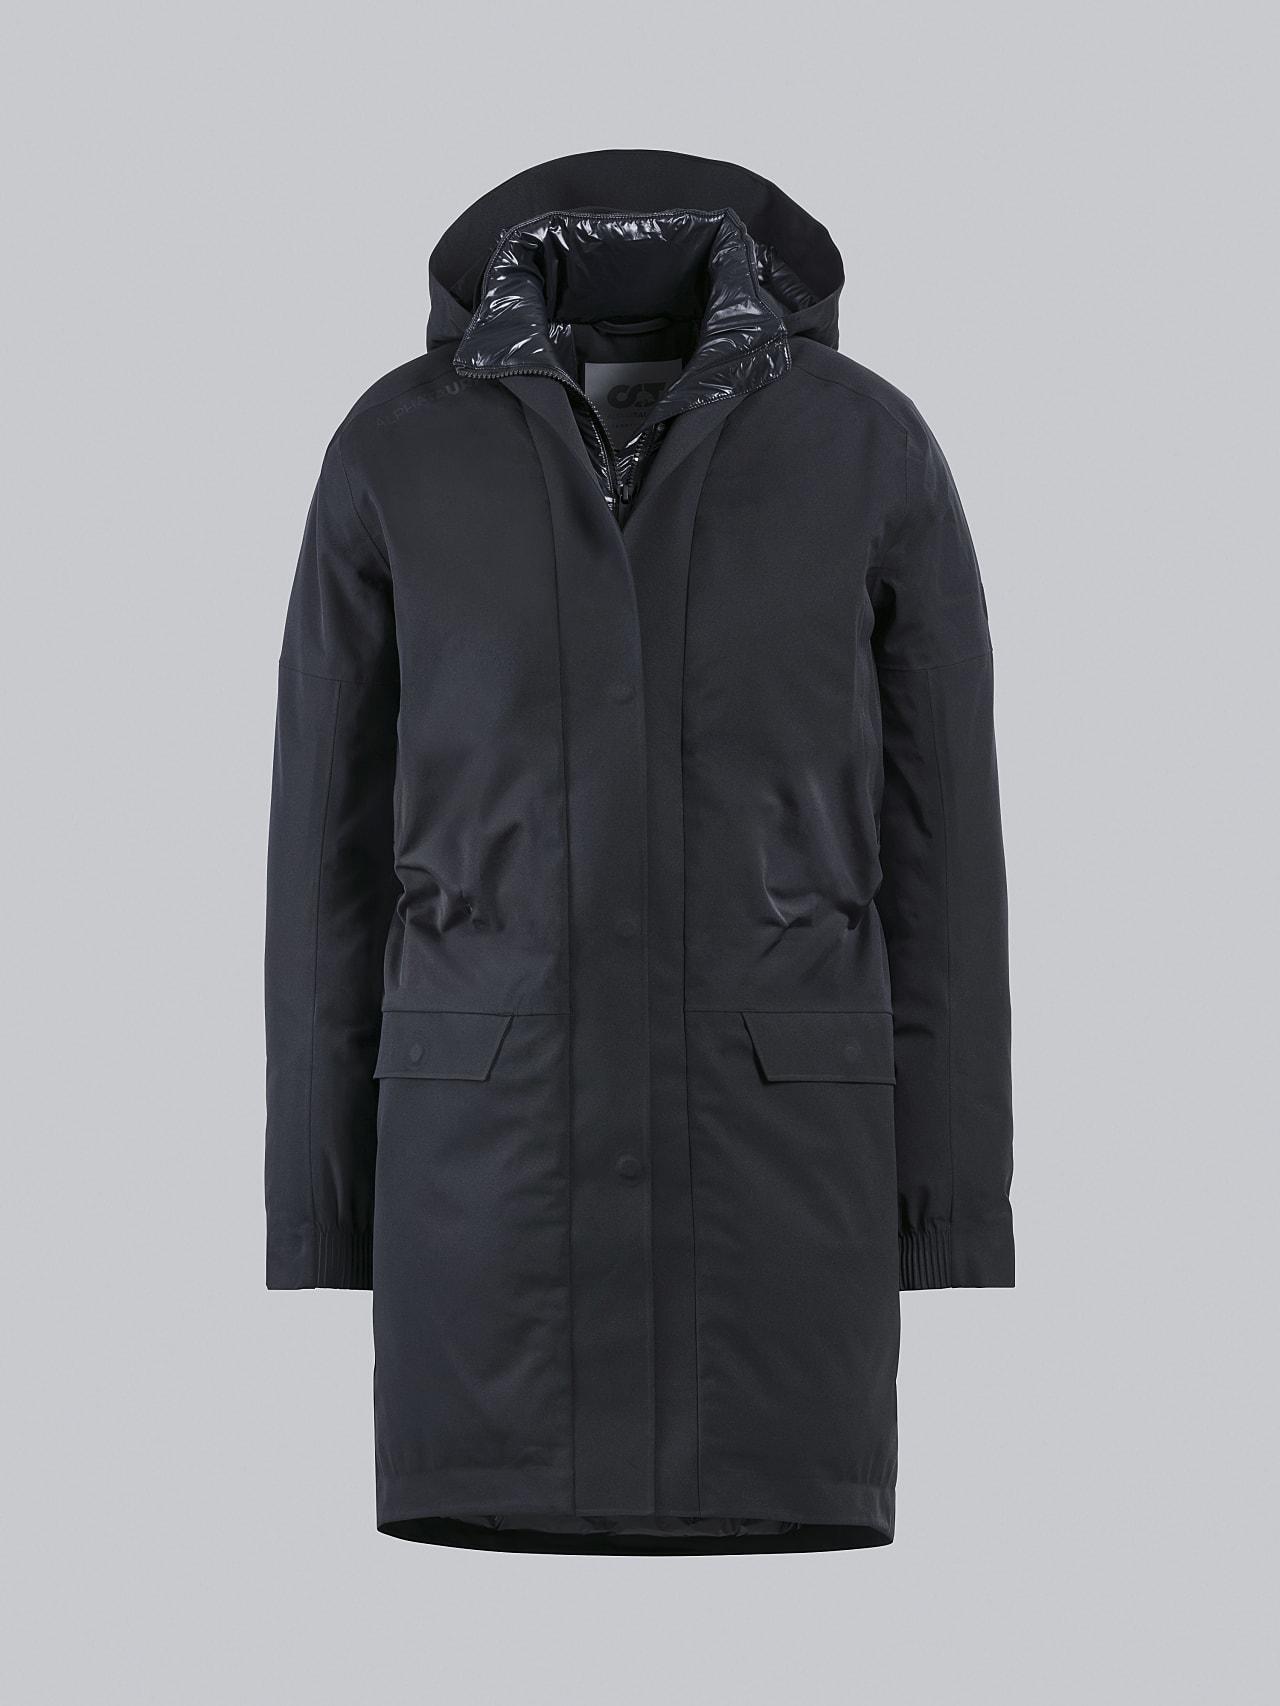 KUUV V2.Y4.02 Packable Waterproof Winter Parka black Back Alpha Tauri